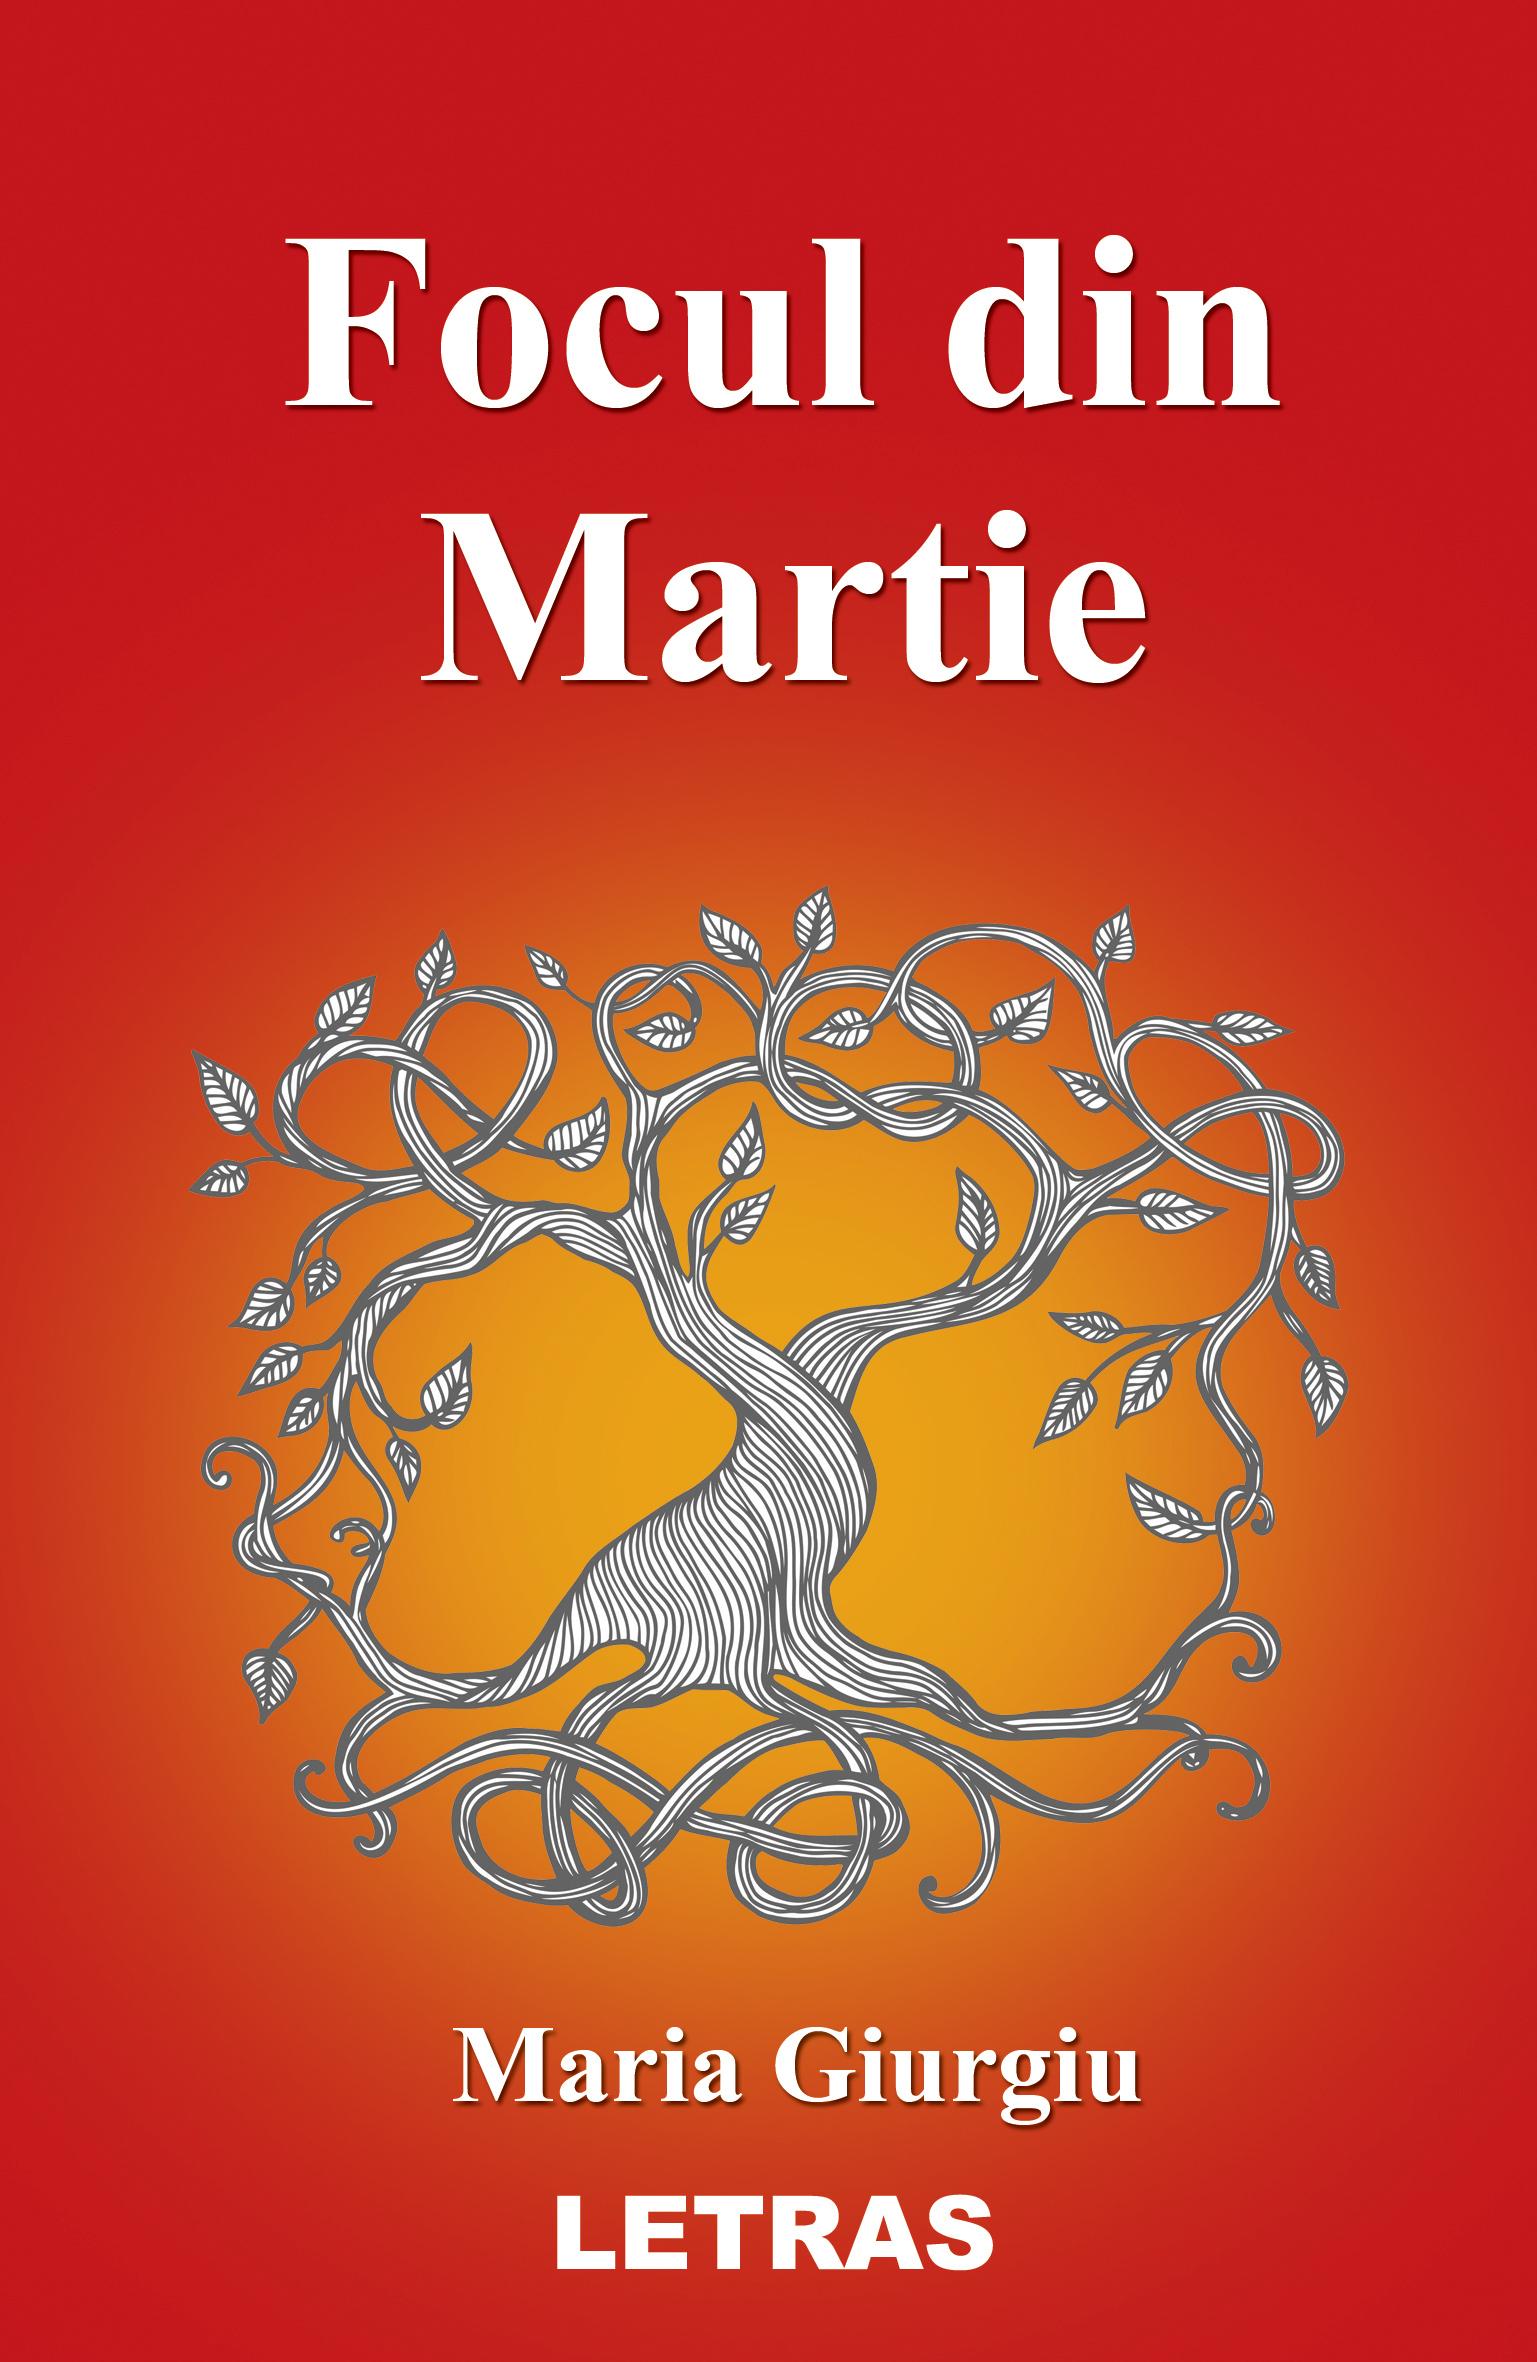 Focul din martie - eBook PDF - Maria Giurgiu - Editura Letras